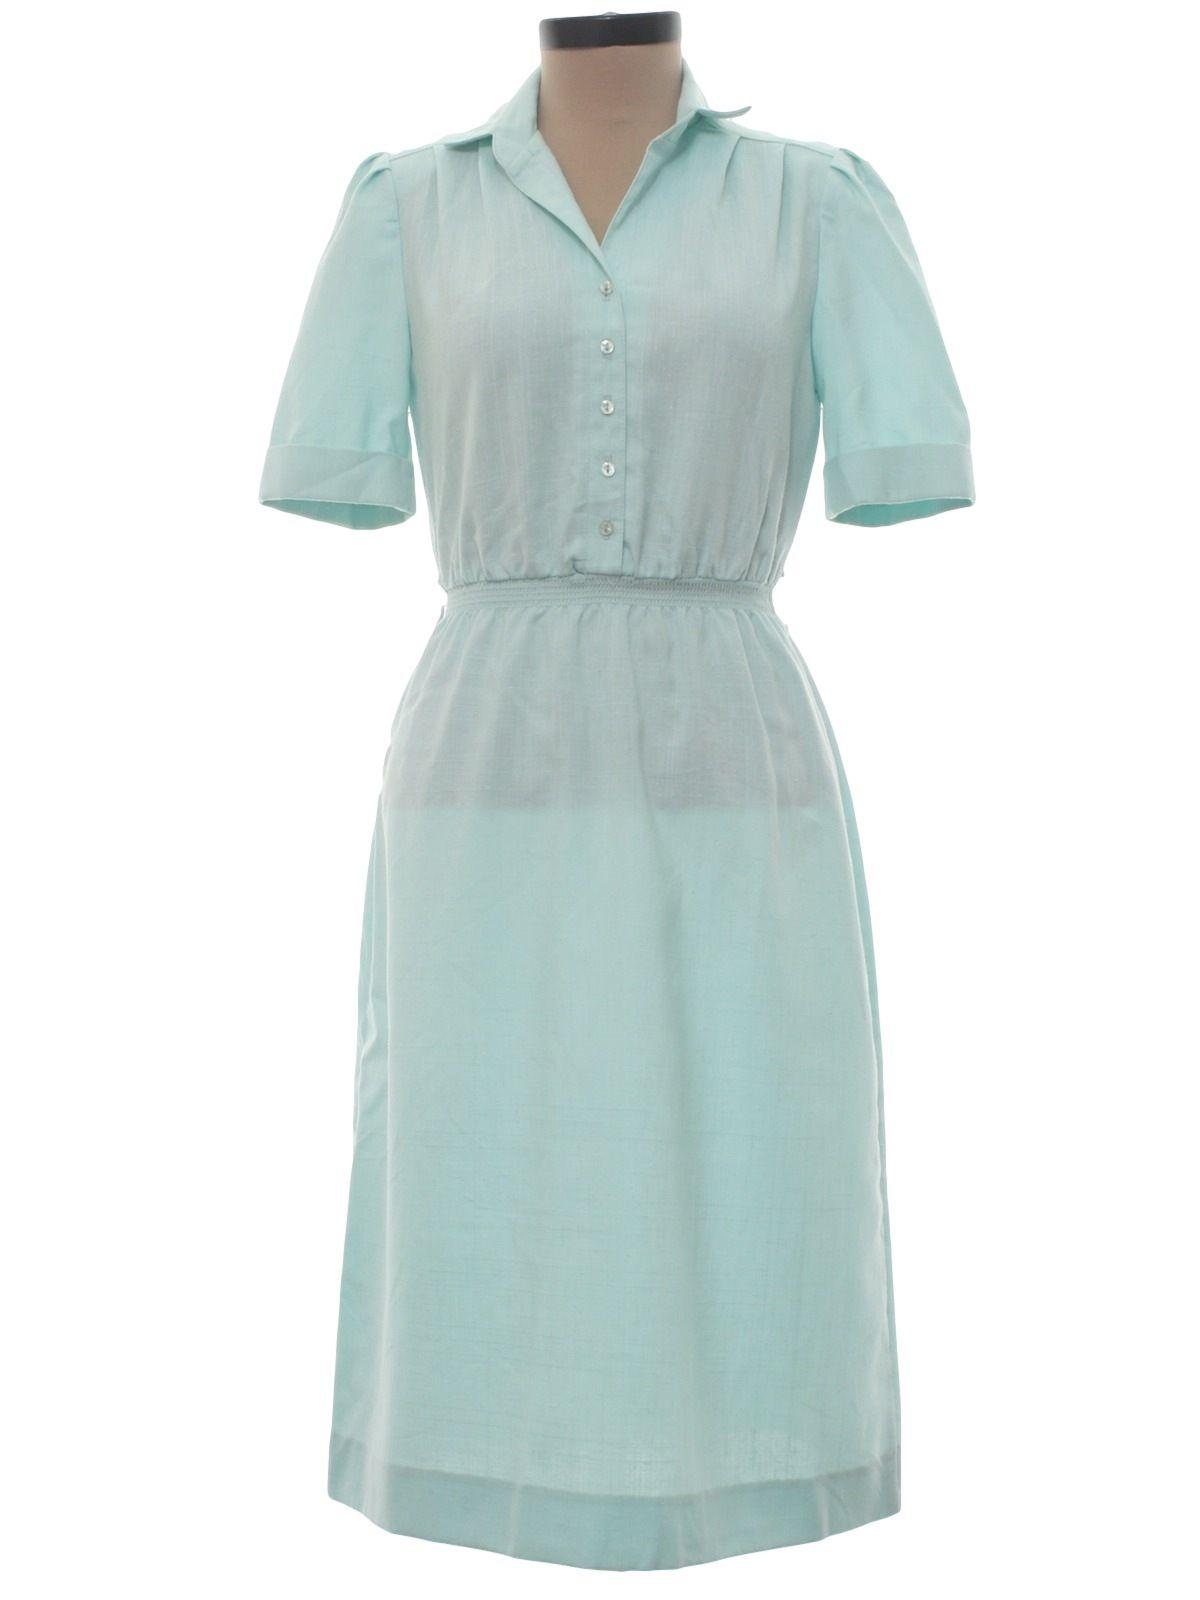 528005d80cb3 Leslie Fay 1980s Vintage Dress  80s -Leslie Fay- Womens soft sea foam green